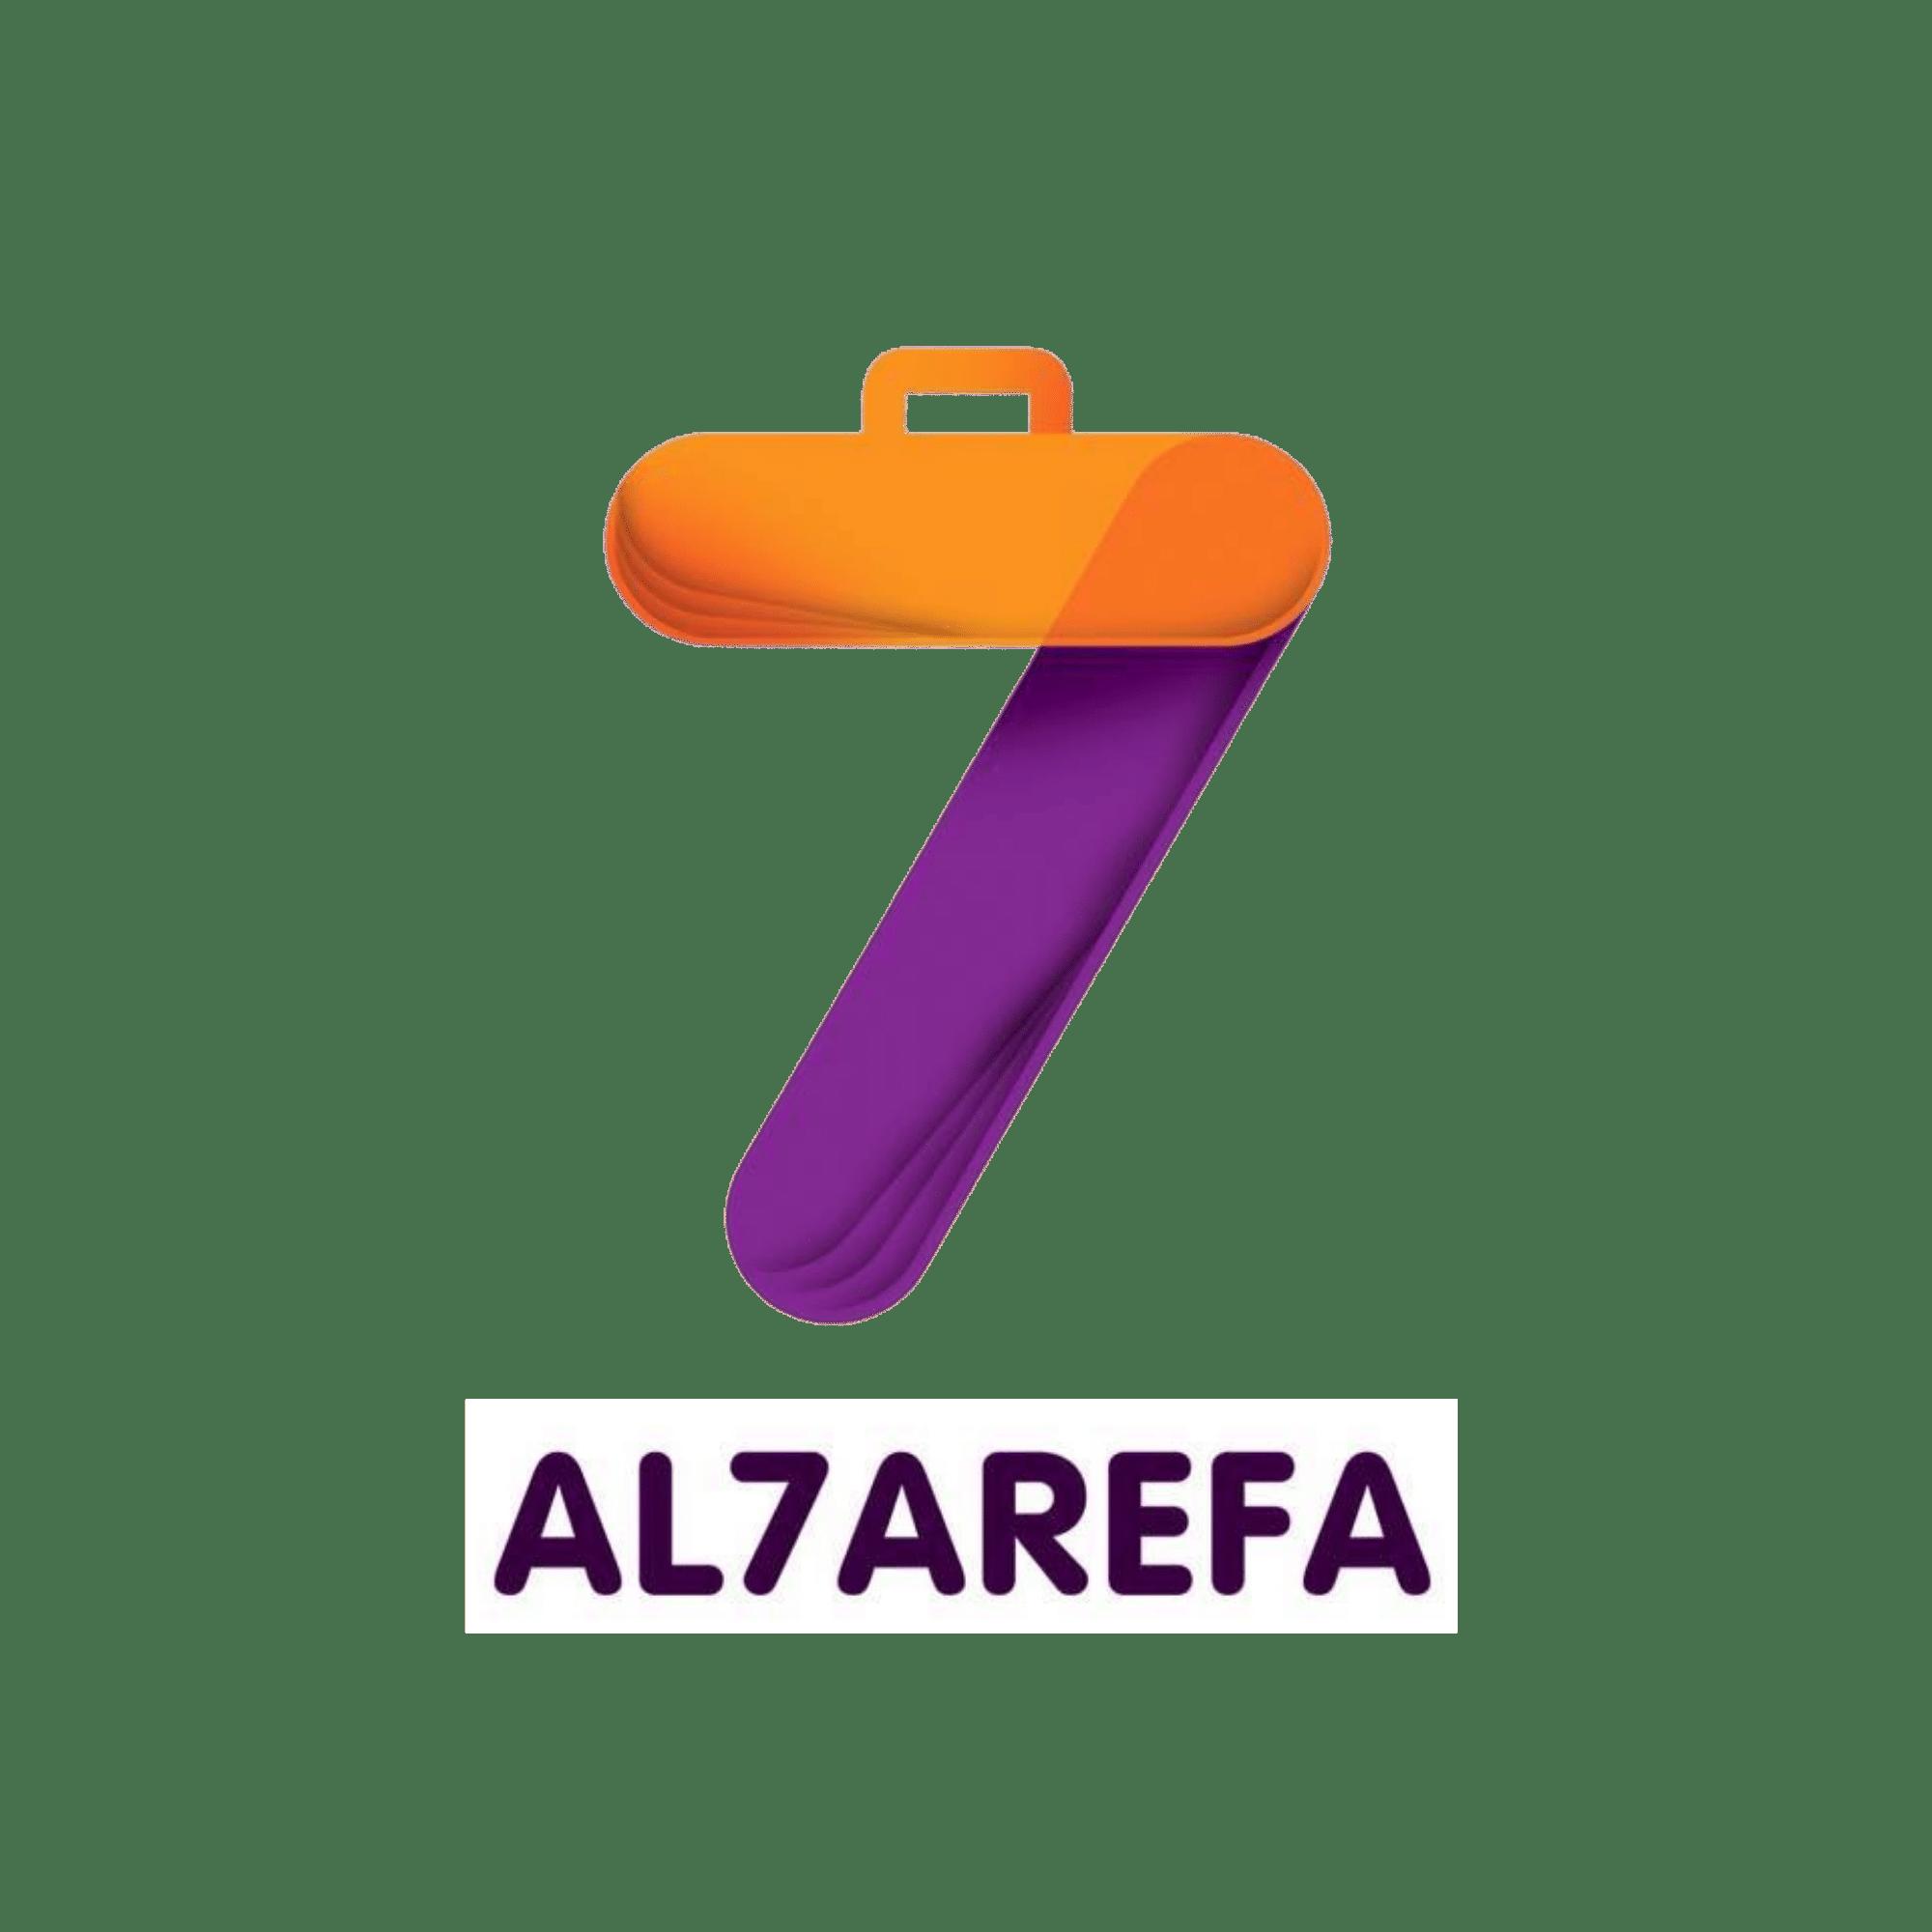 6. AL 7AFREFA (1)